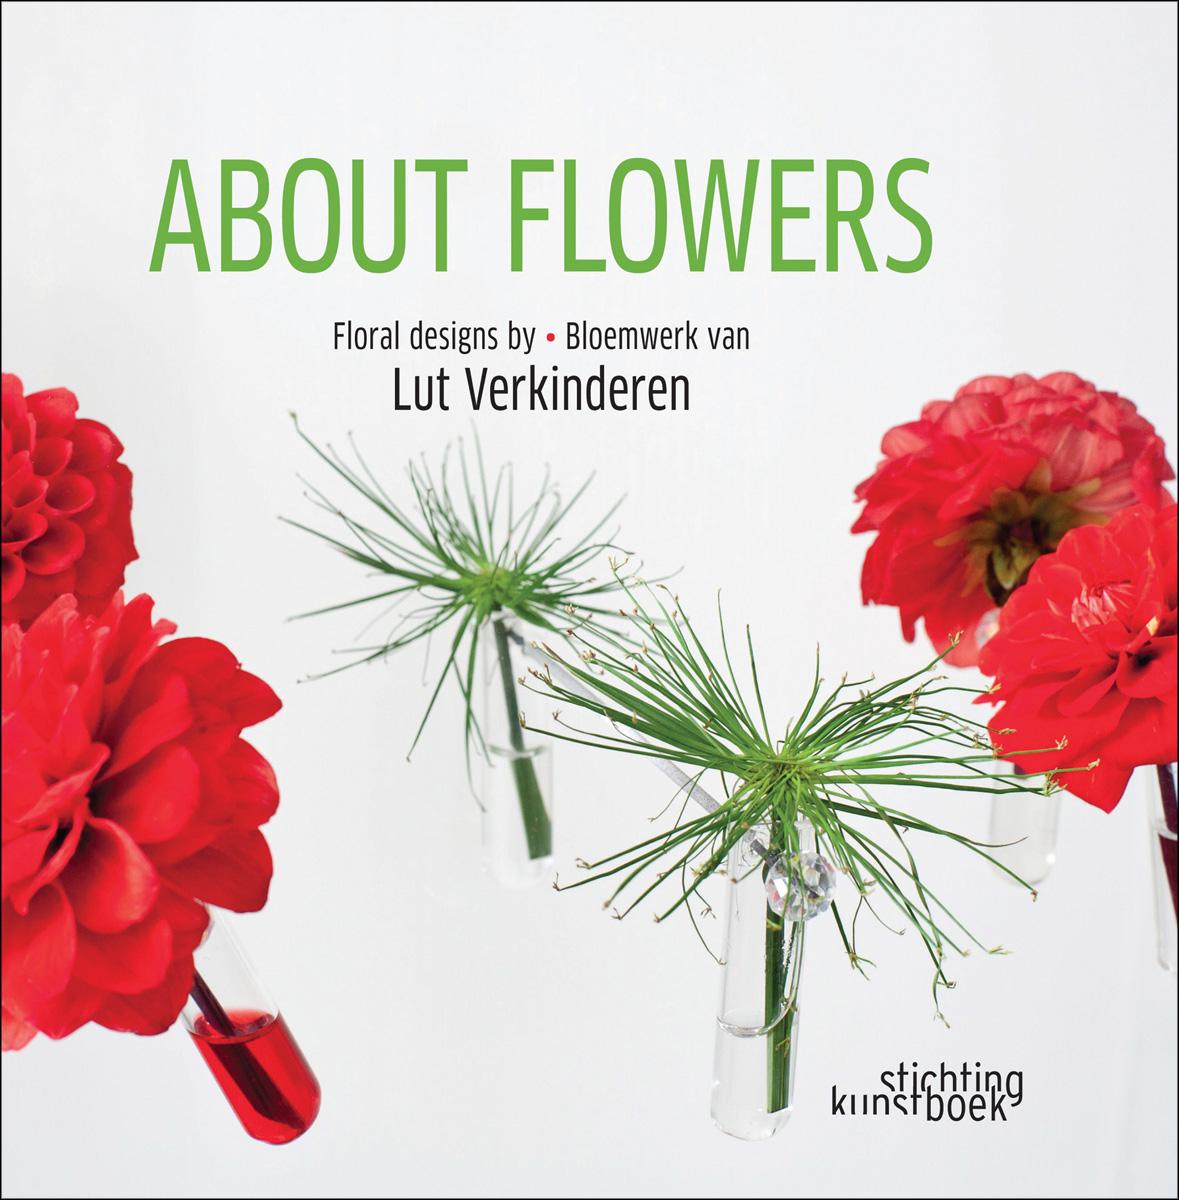 About Flowers: Floral Design by Lut Verkinderen